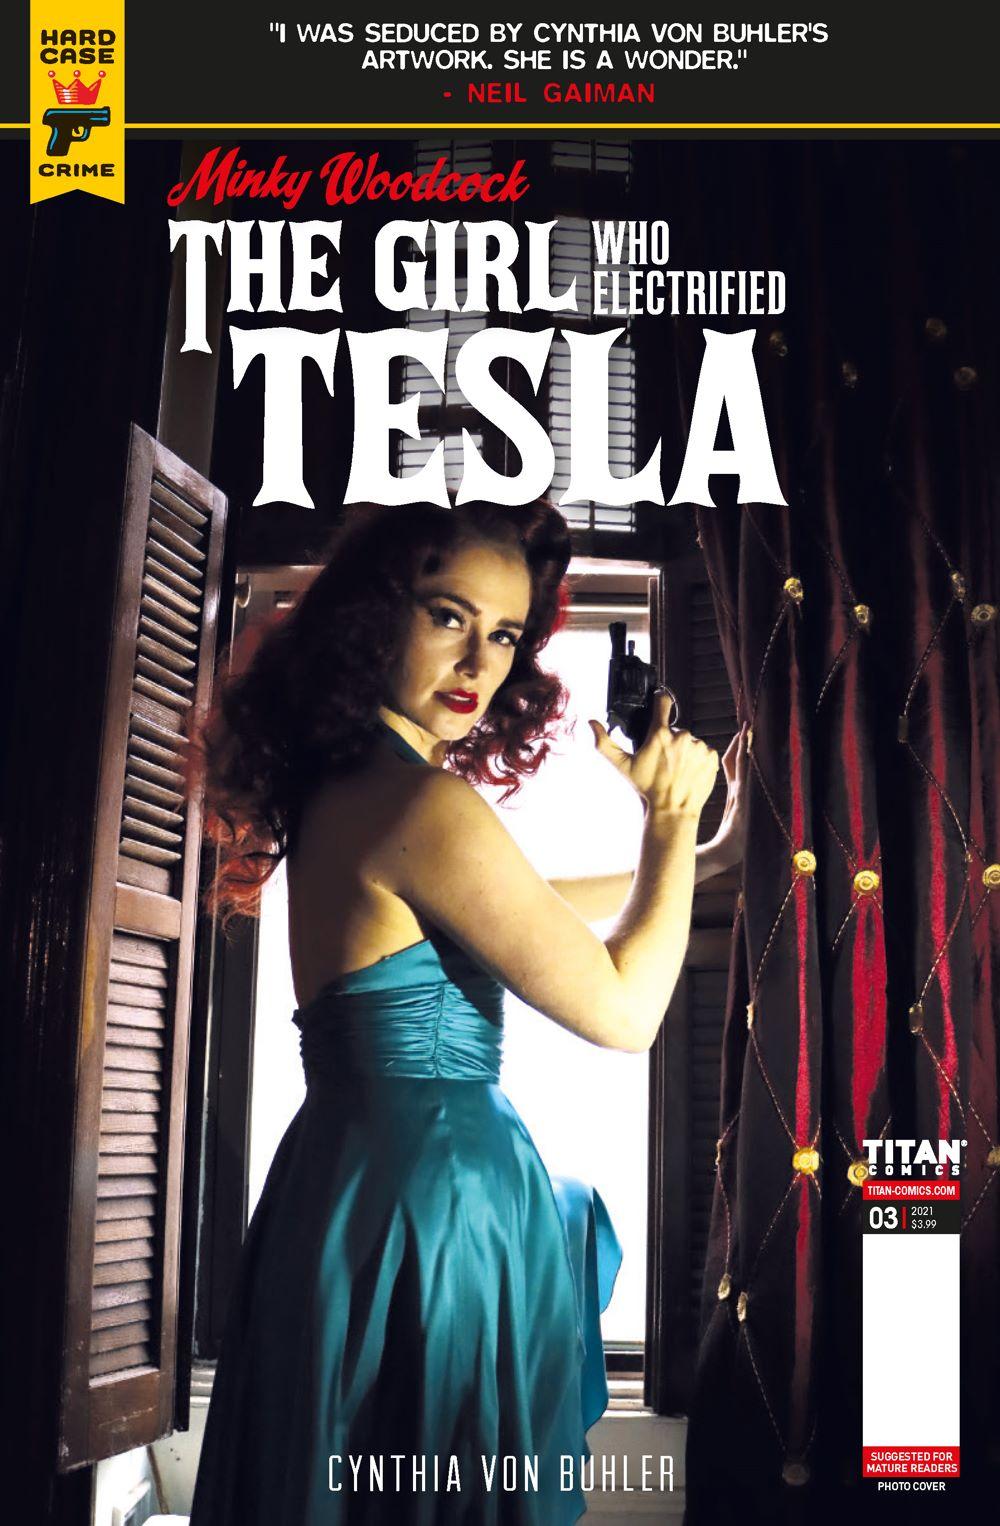 MINKY_WOODCOCK_ARC2_3_COVER_Page_2 ComicList Previews: MINKY WOODCOCK THE GIRL WHO ELECTRIFIED TESLA #3